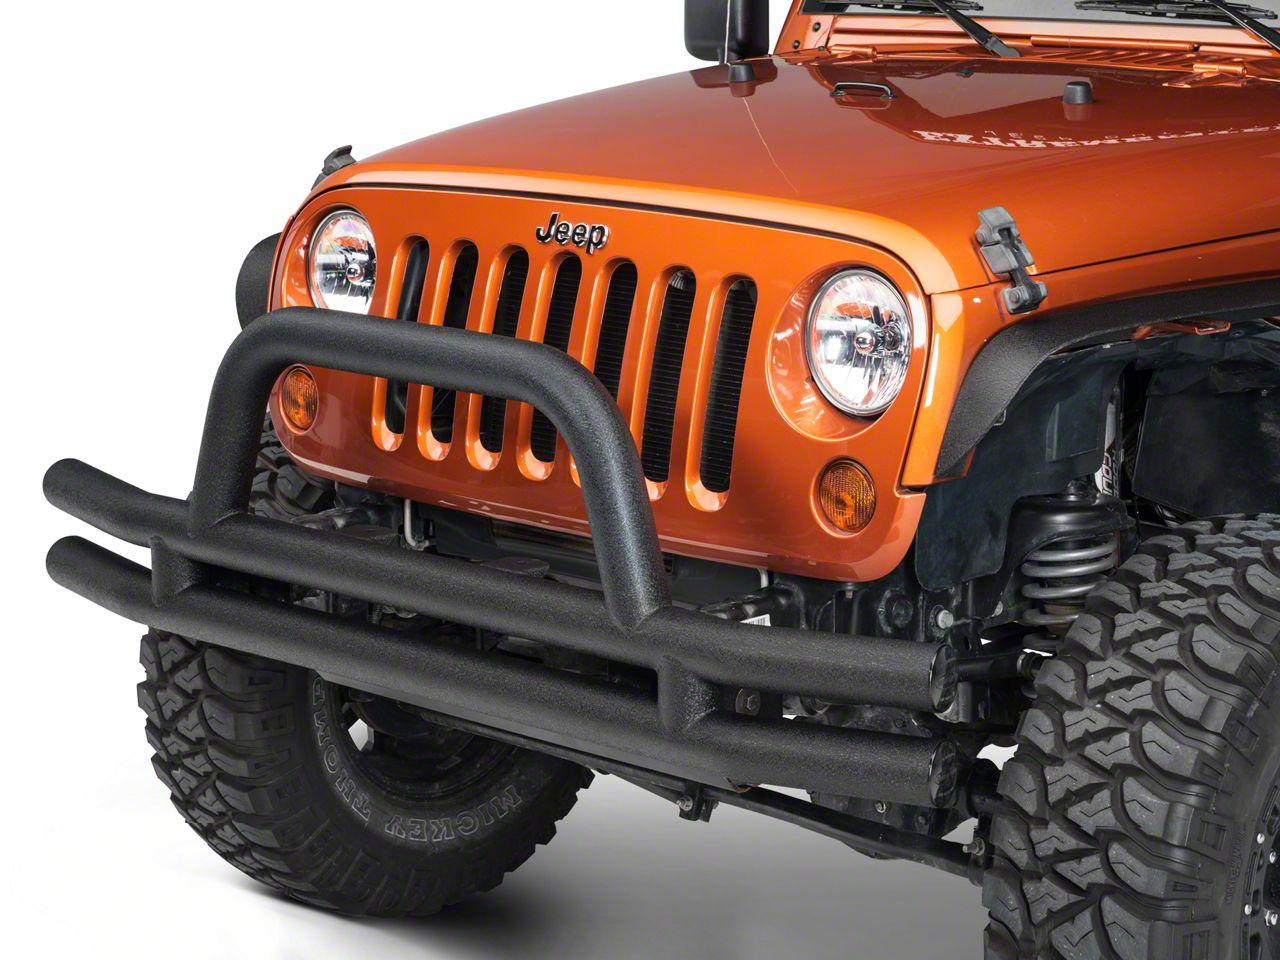 Smittybilt 3 in. Front Tubular Bumper w/ Hoop - Textured Black (07-18 Jeep Wrangler JK)